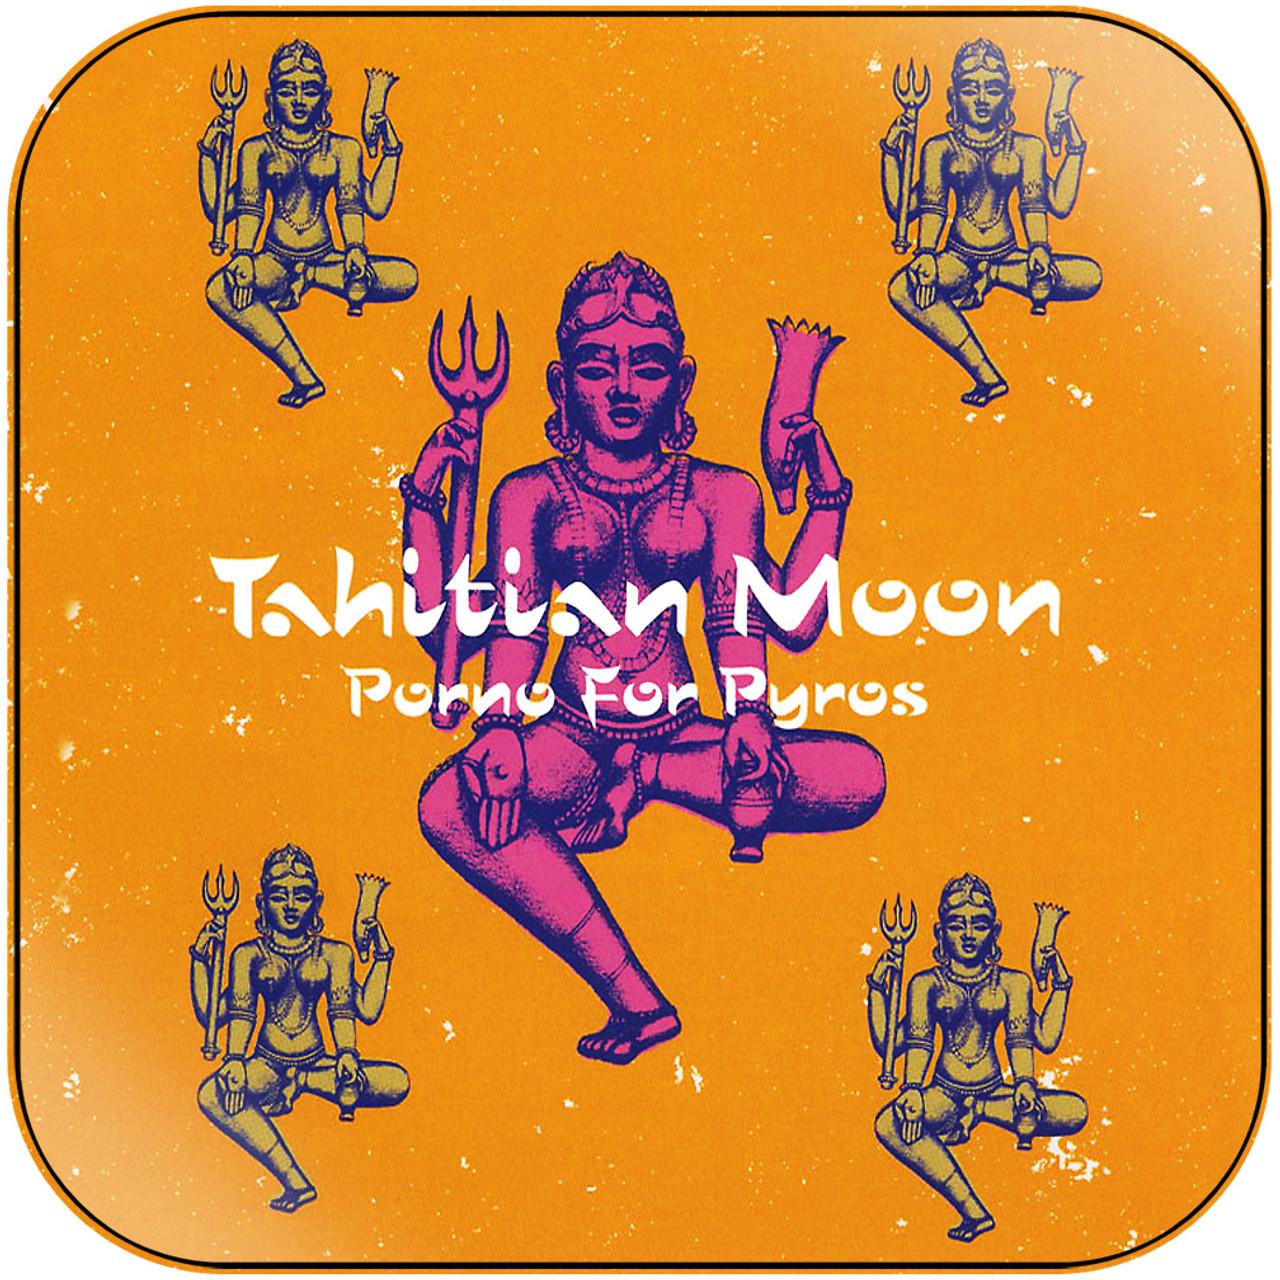 Album Porno porno for pyros - tahitian moon album cover sticker album cover sticker